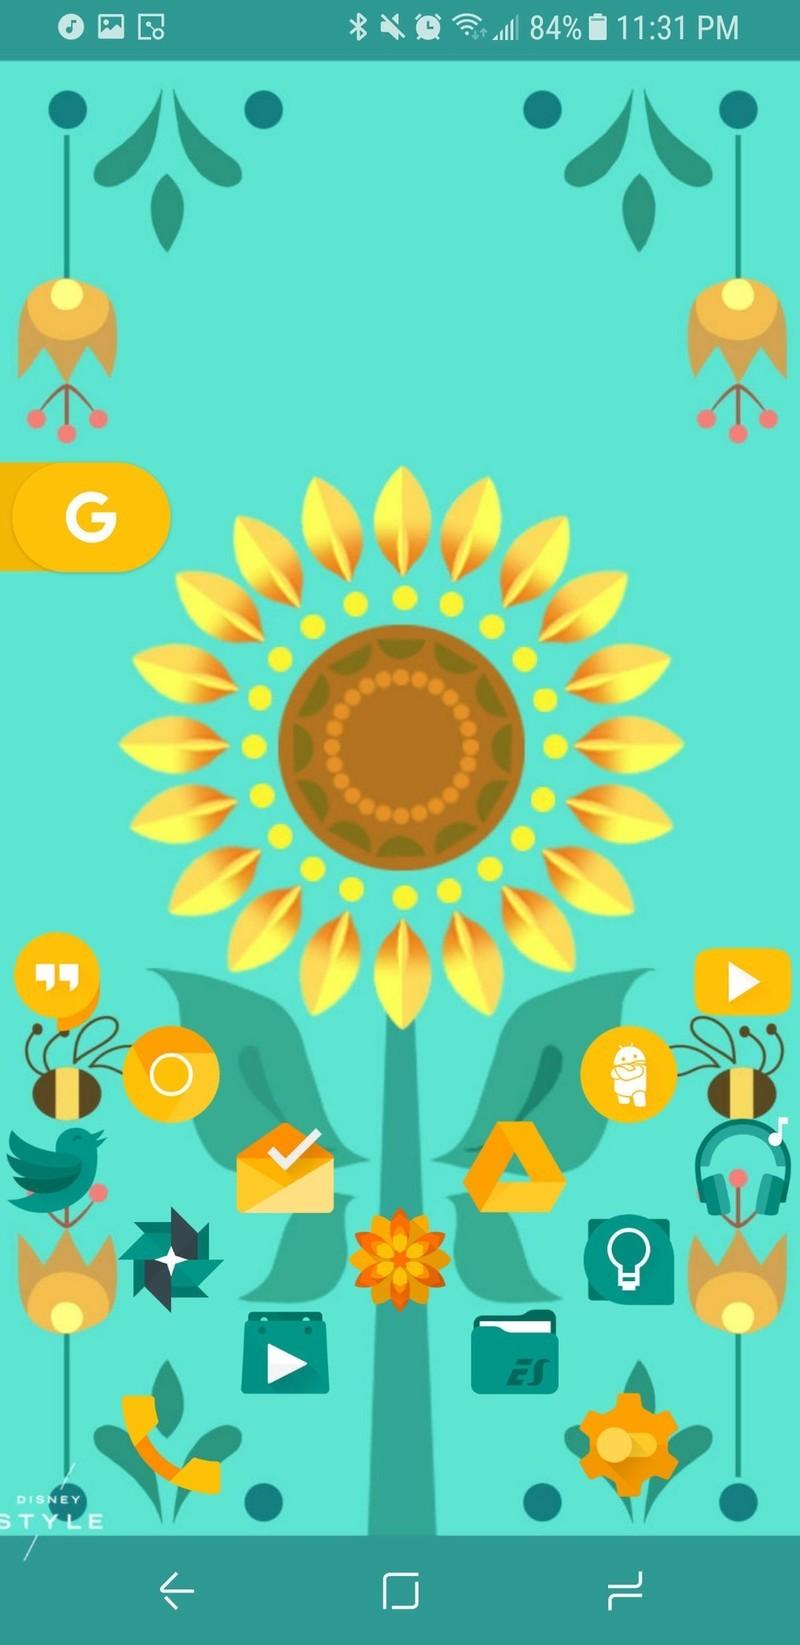 summer-themes-search-15.jpg?itok=XuPBFk0